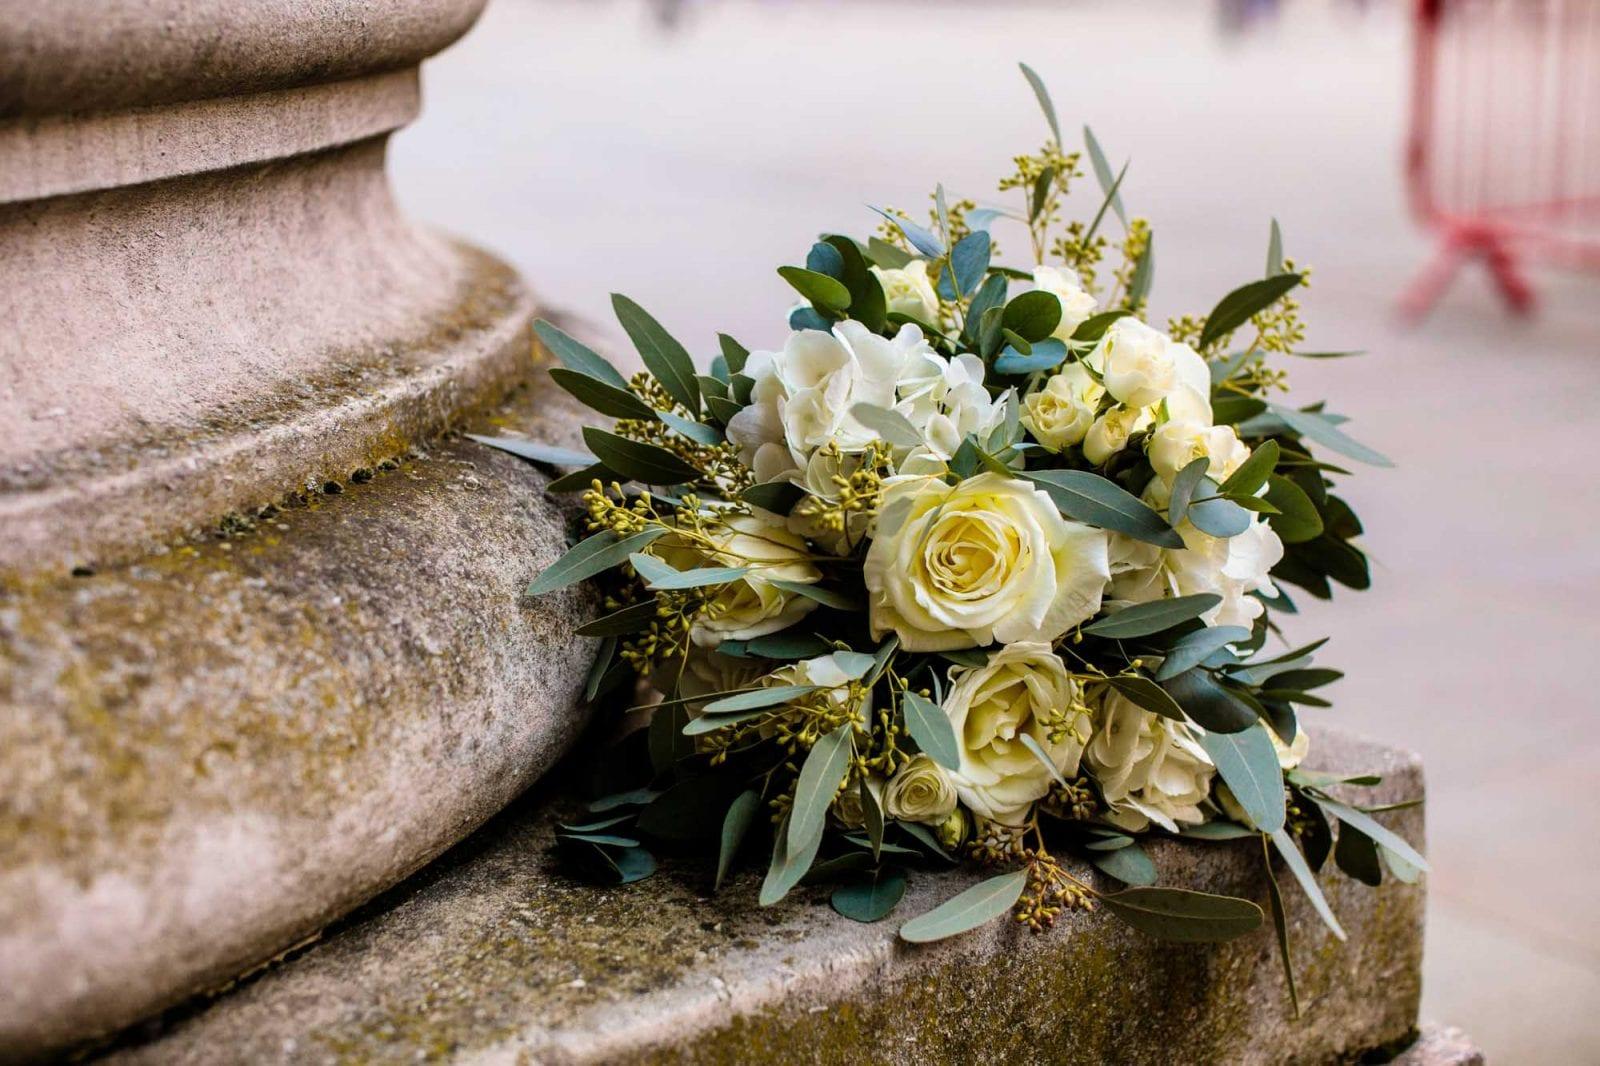 Wedding bouquet of white roses and euycalyptus